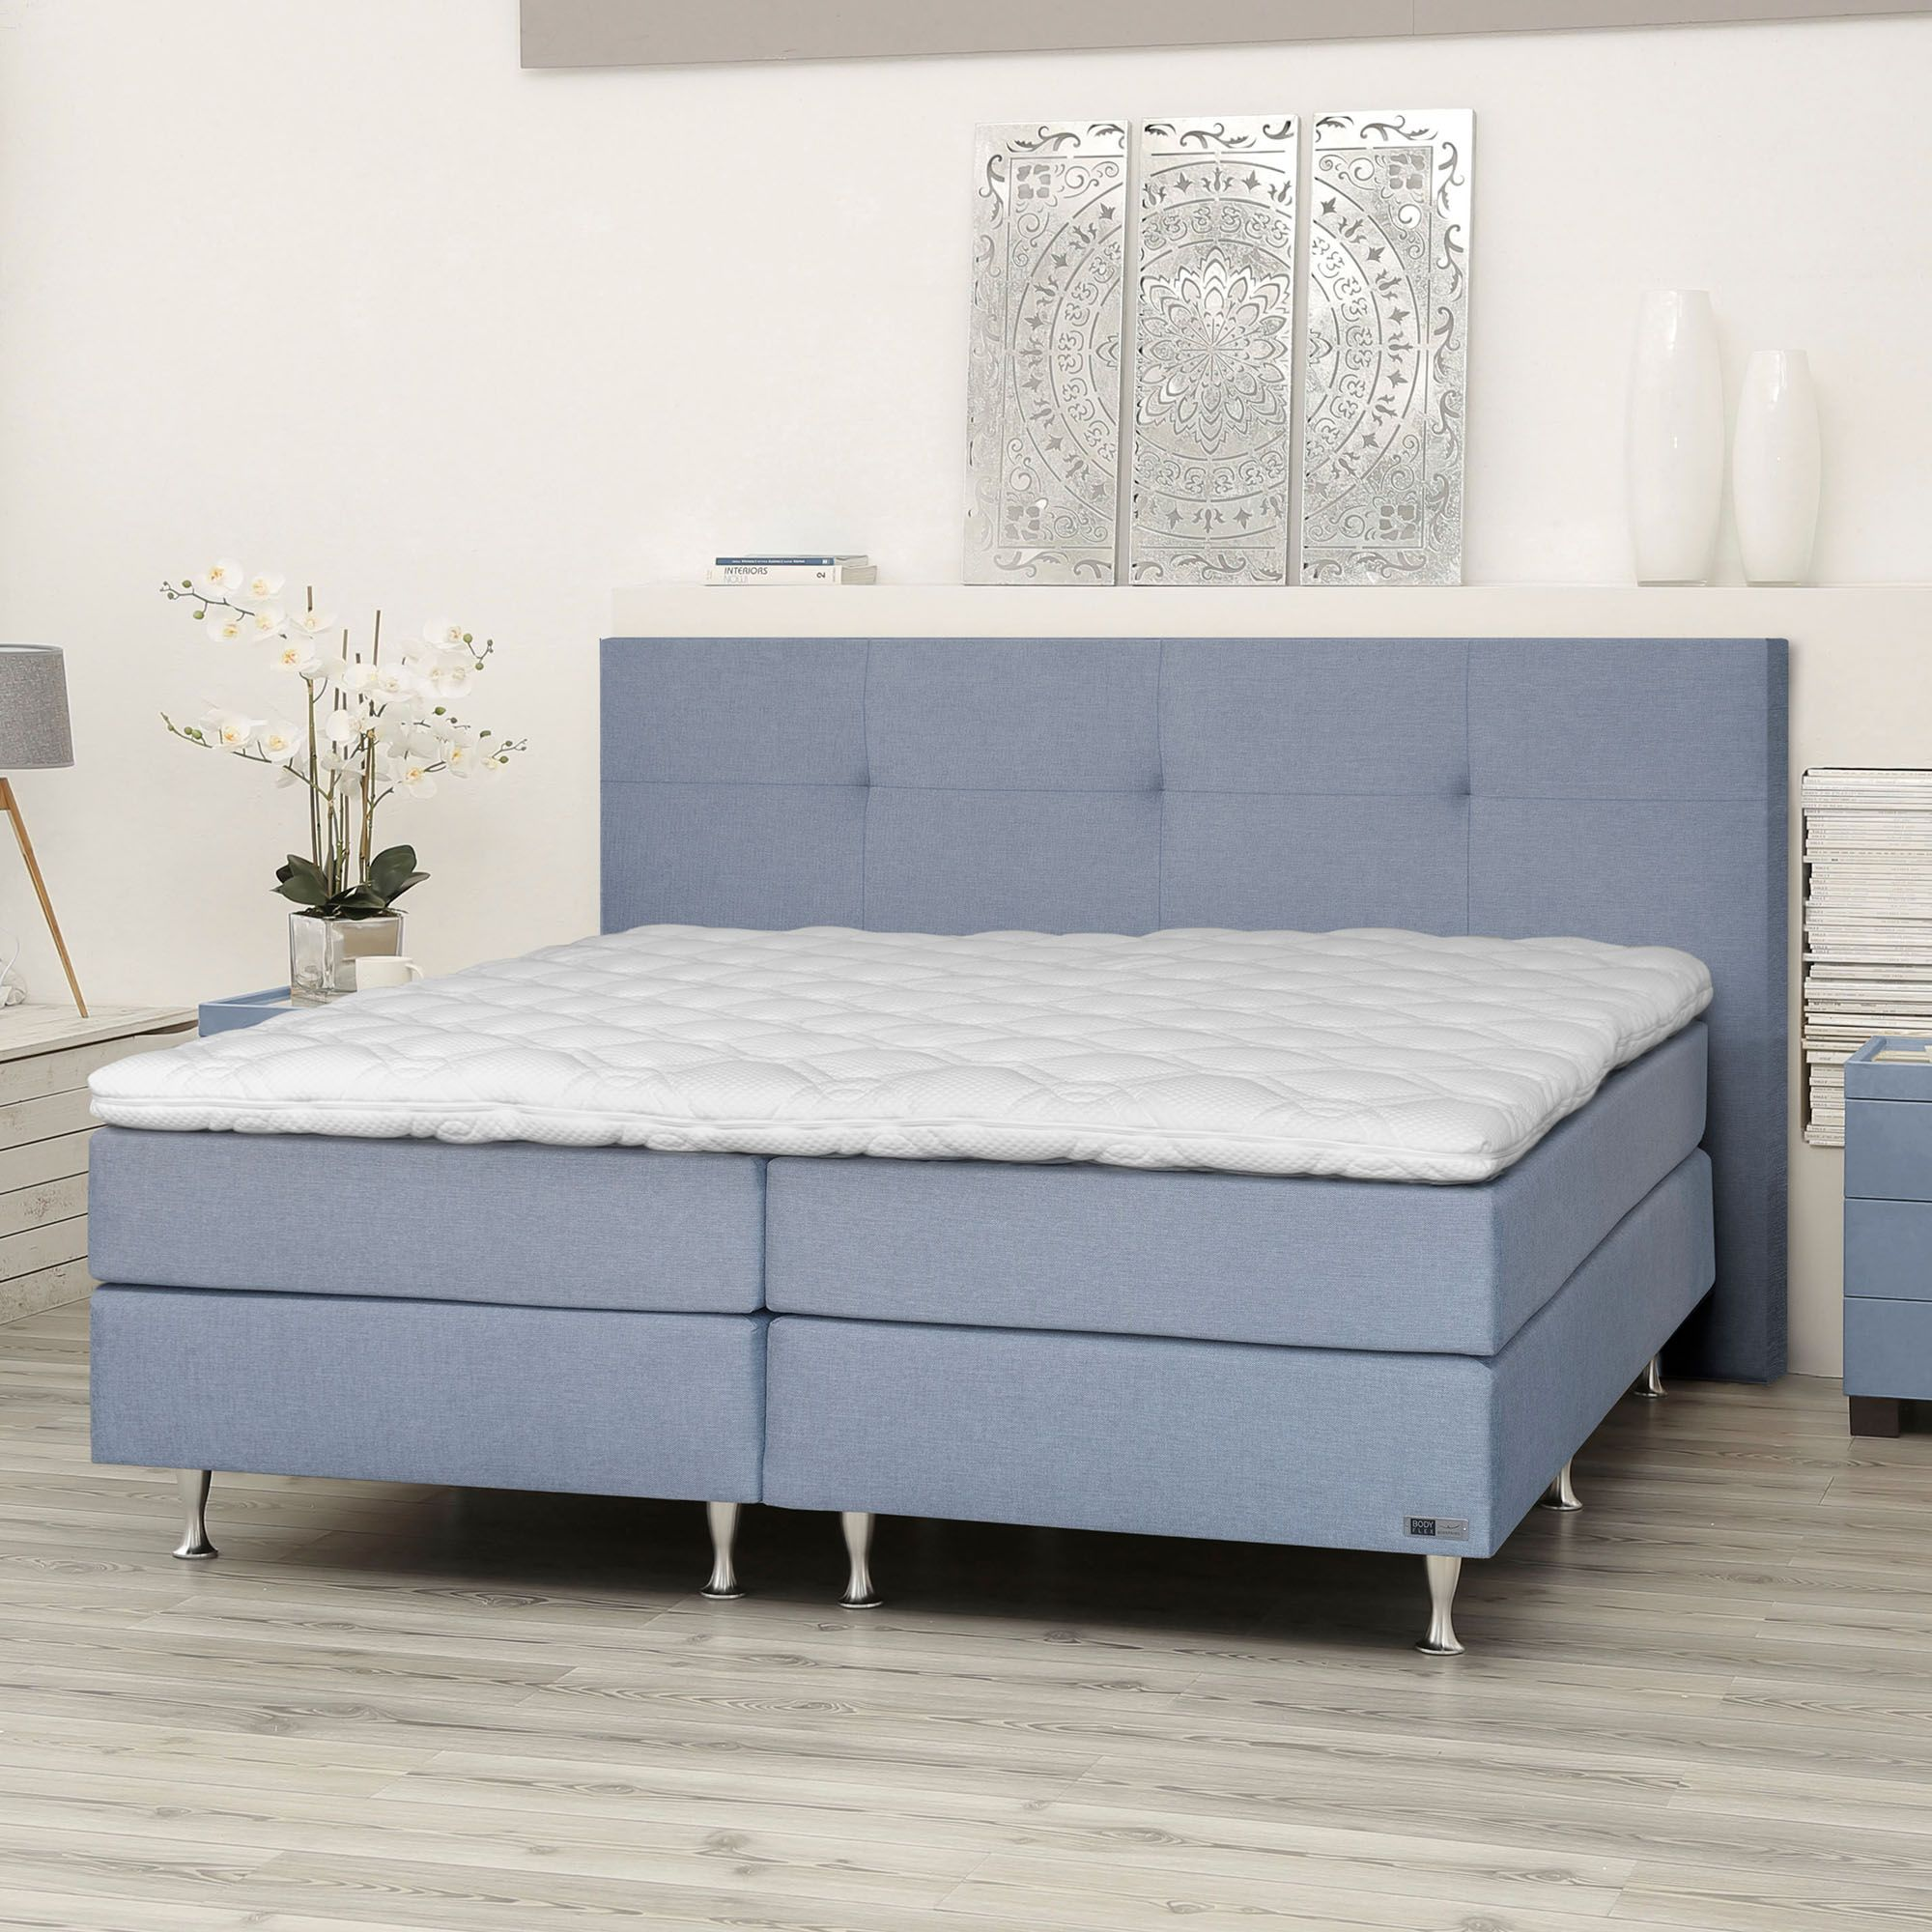 BODYFLEX BOXSPRING Bett Gloria Serie Classic Designkopfteil inkl ...